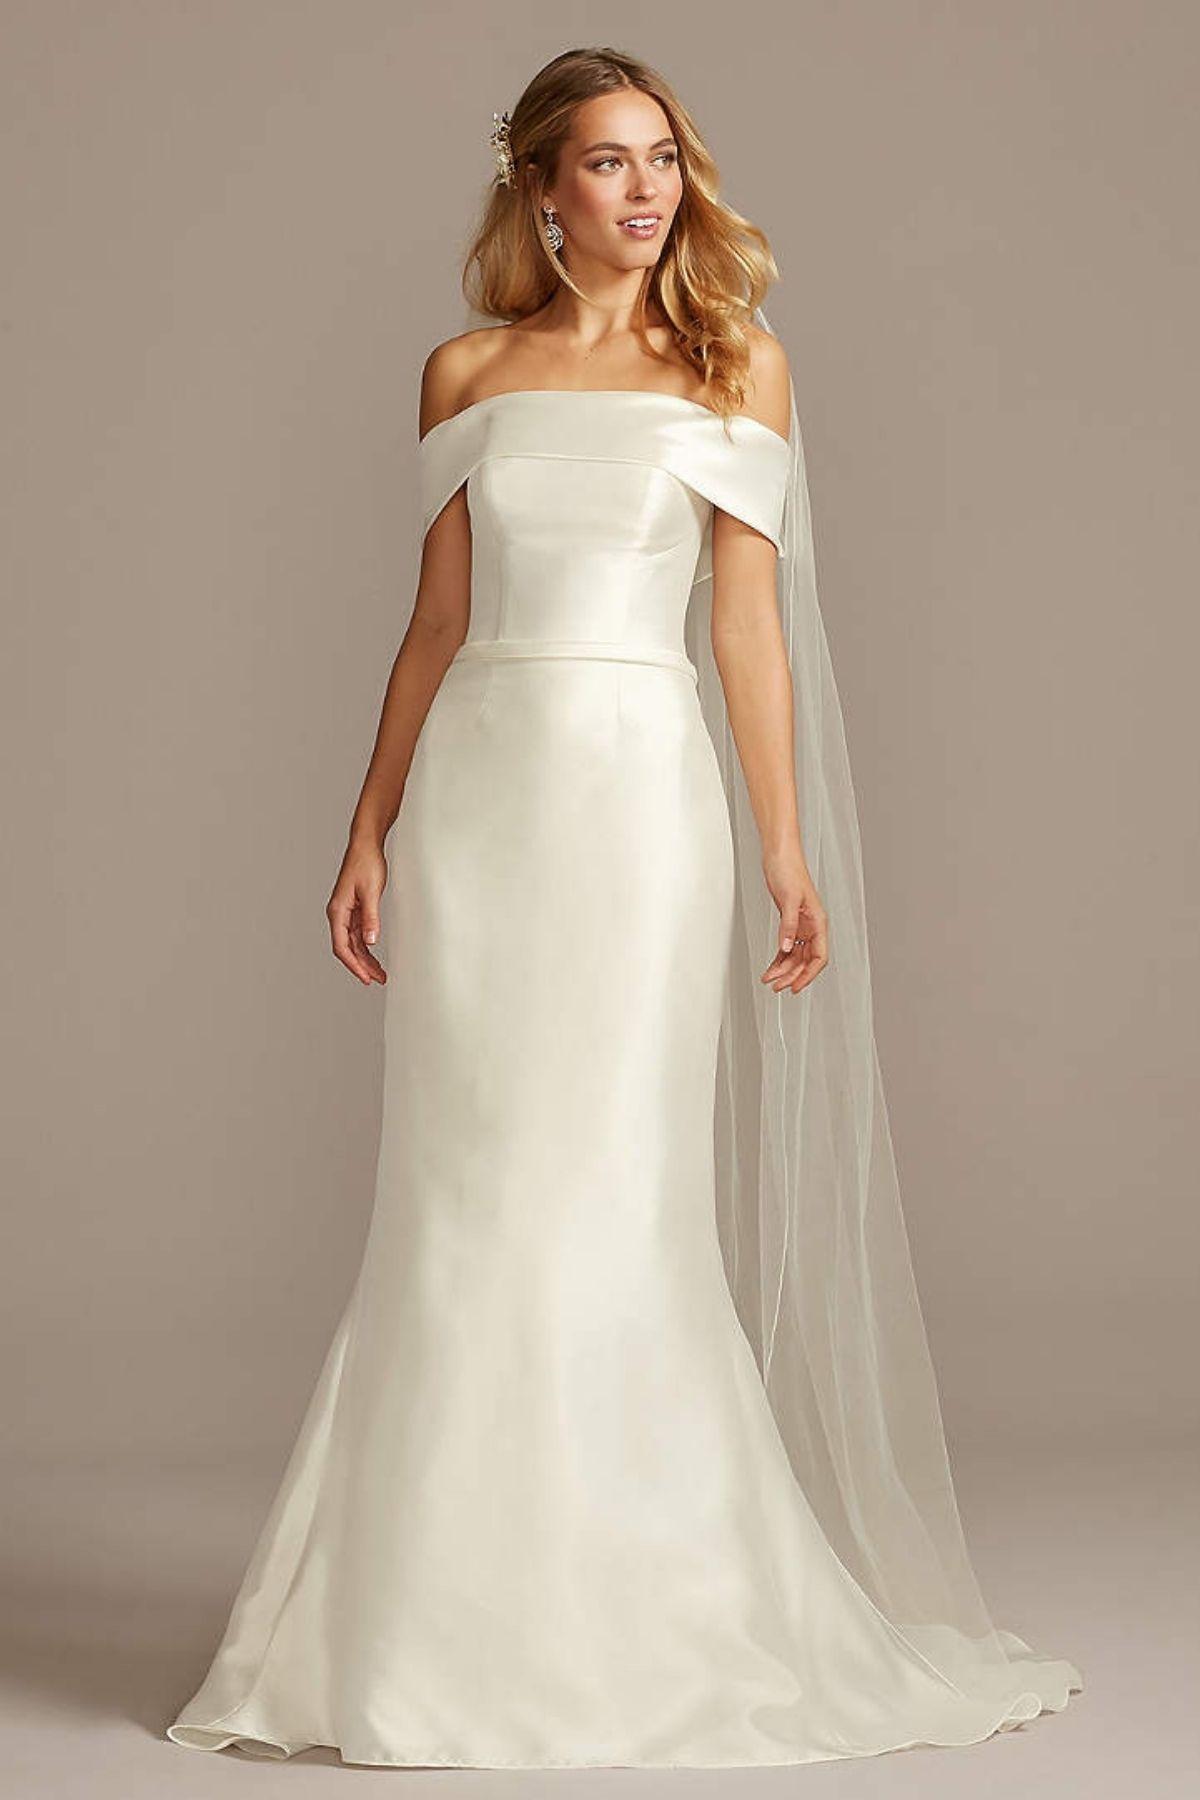 9. Mikado Off-the-Shoulder Trumpet Wedding Dress